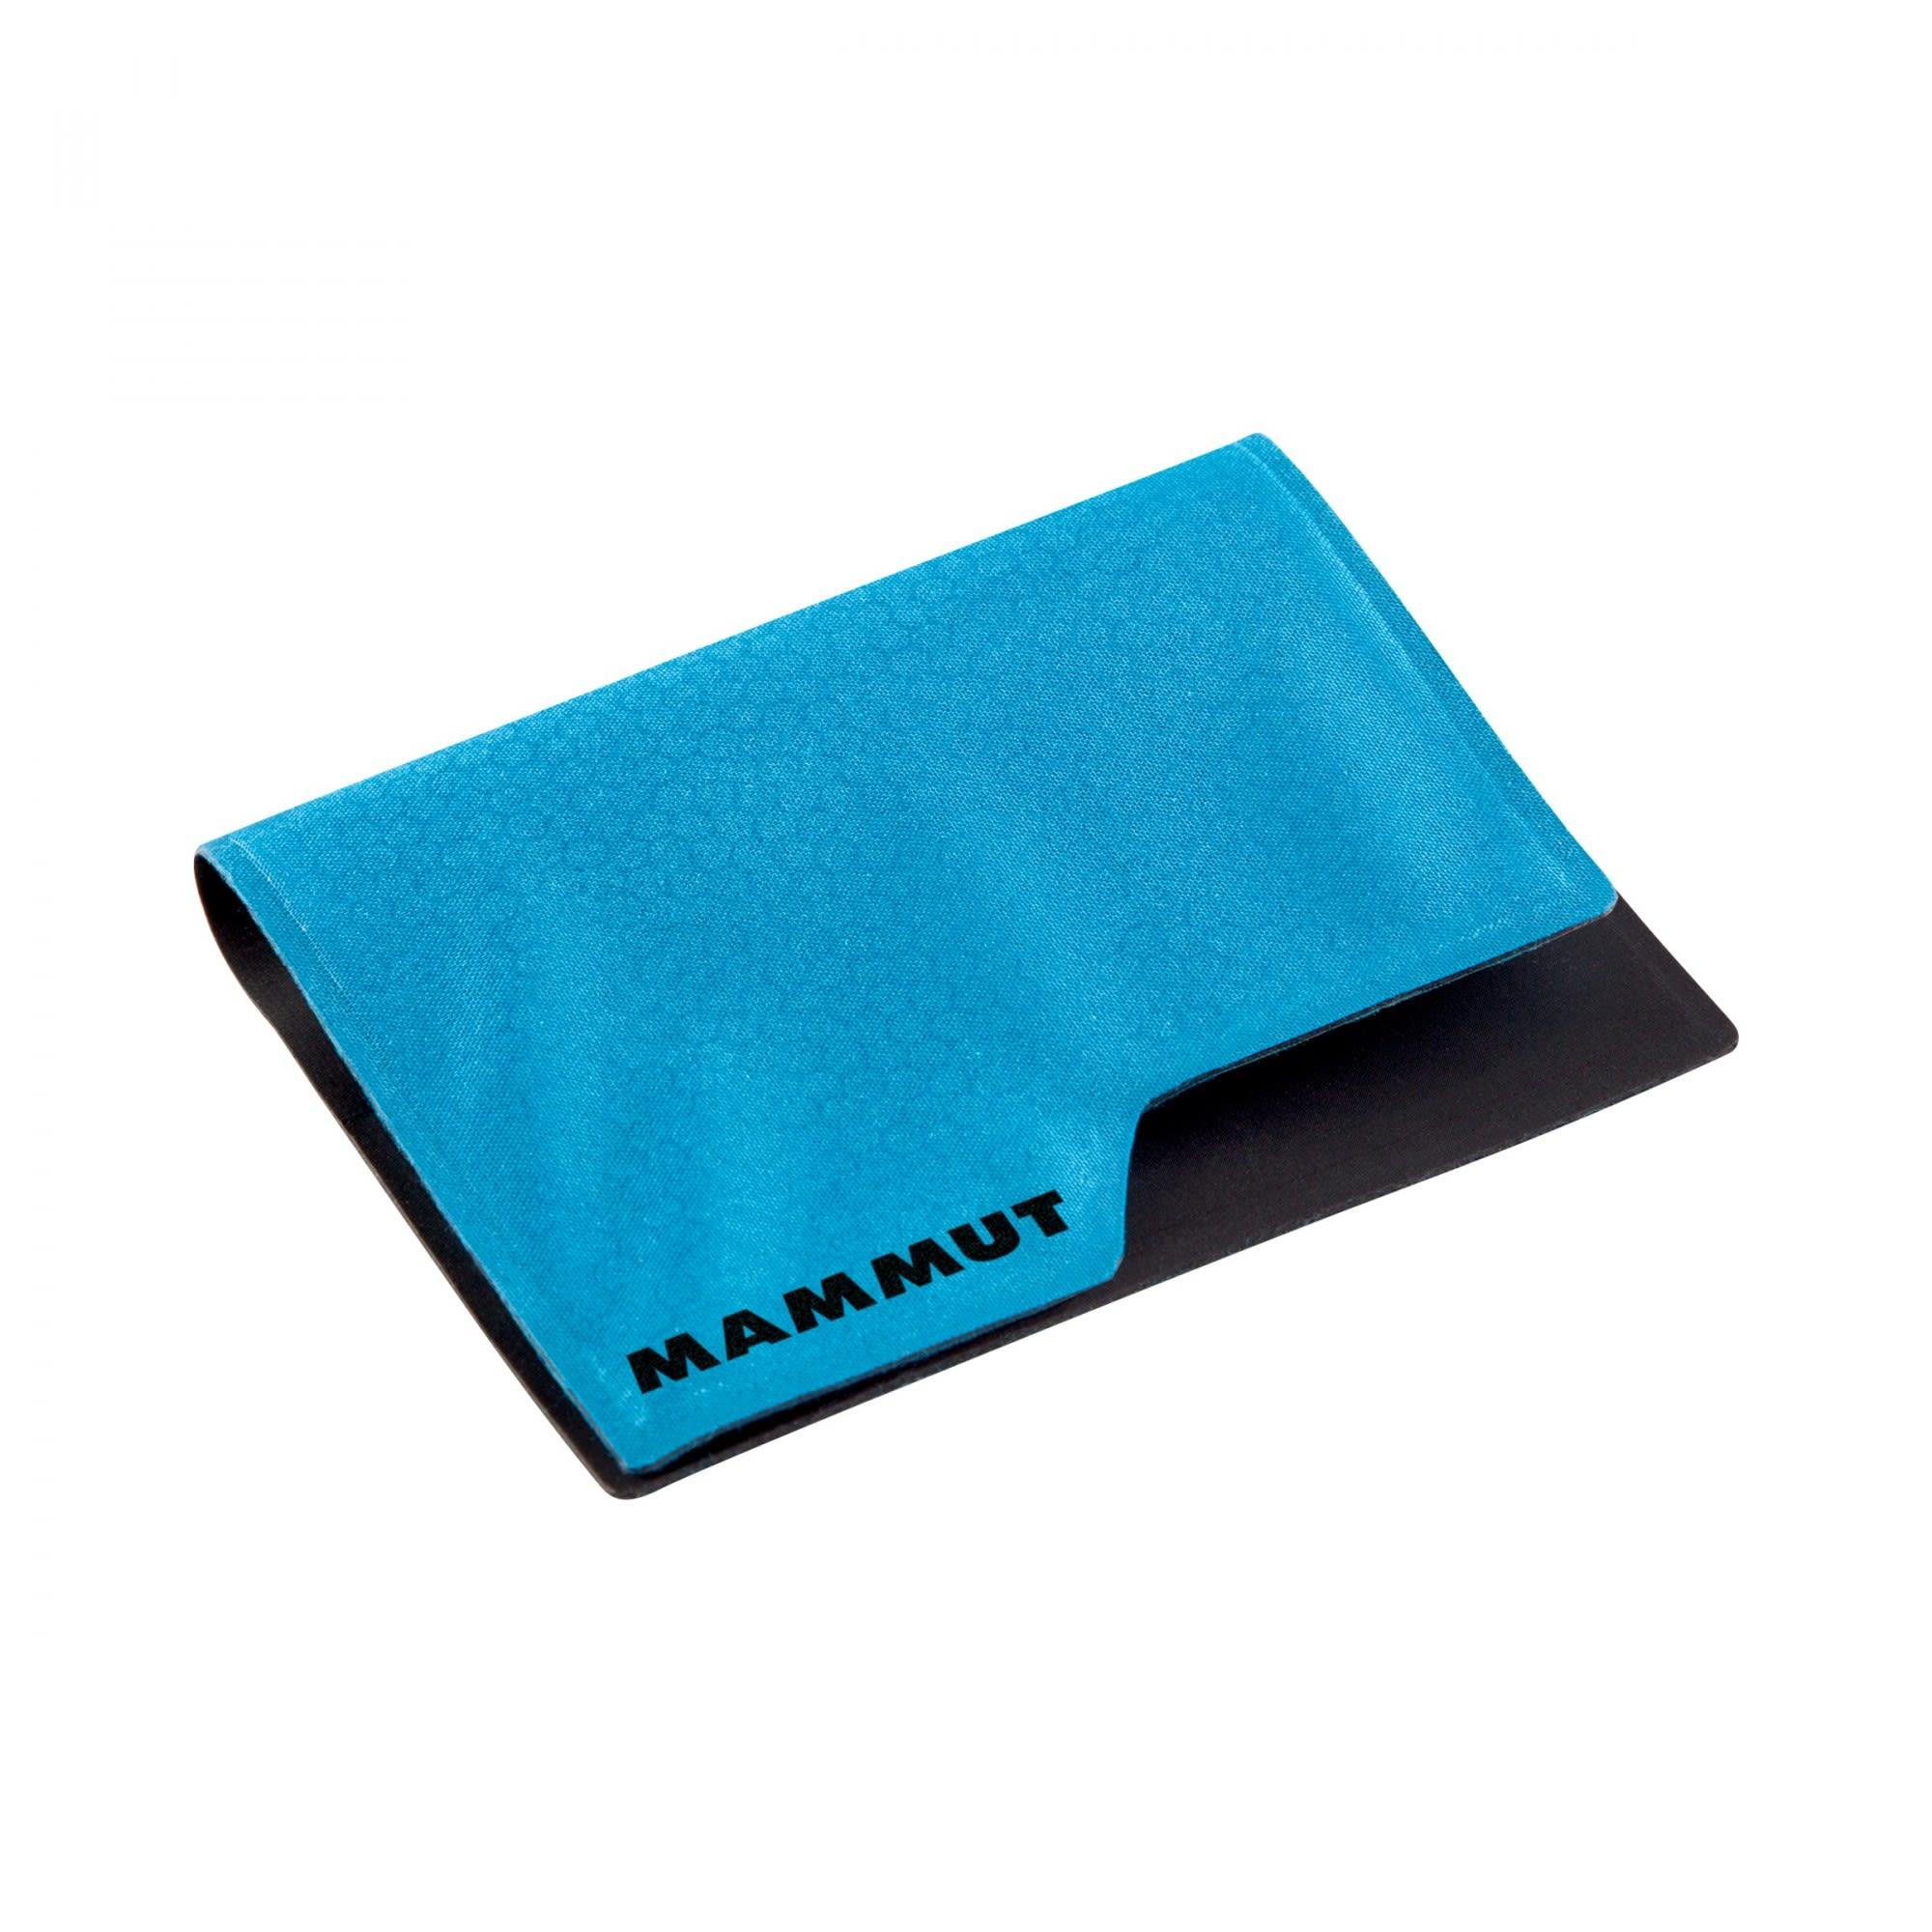 Mammut Smart Wallet Ultralight | Größe One Size |  Geldbörsen